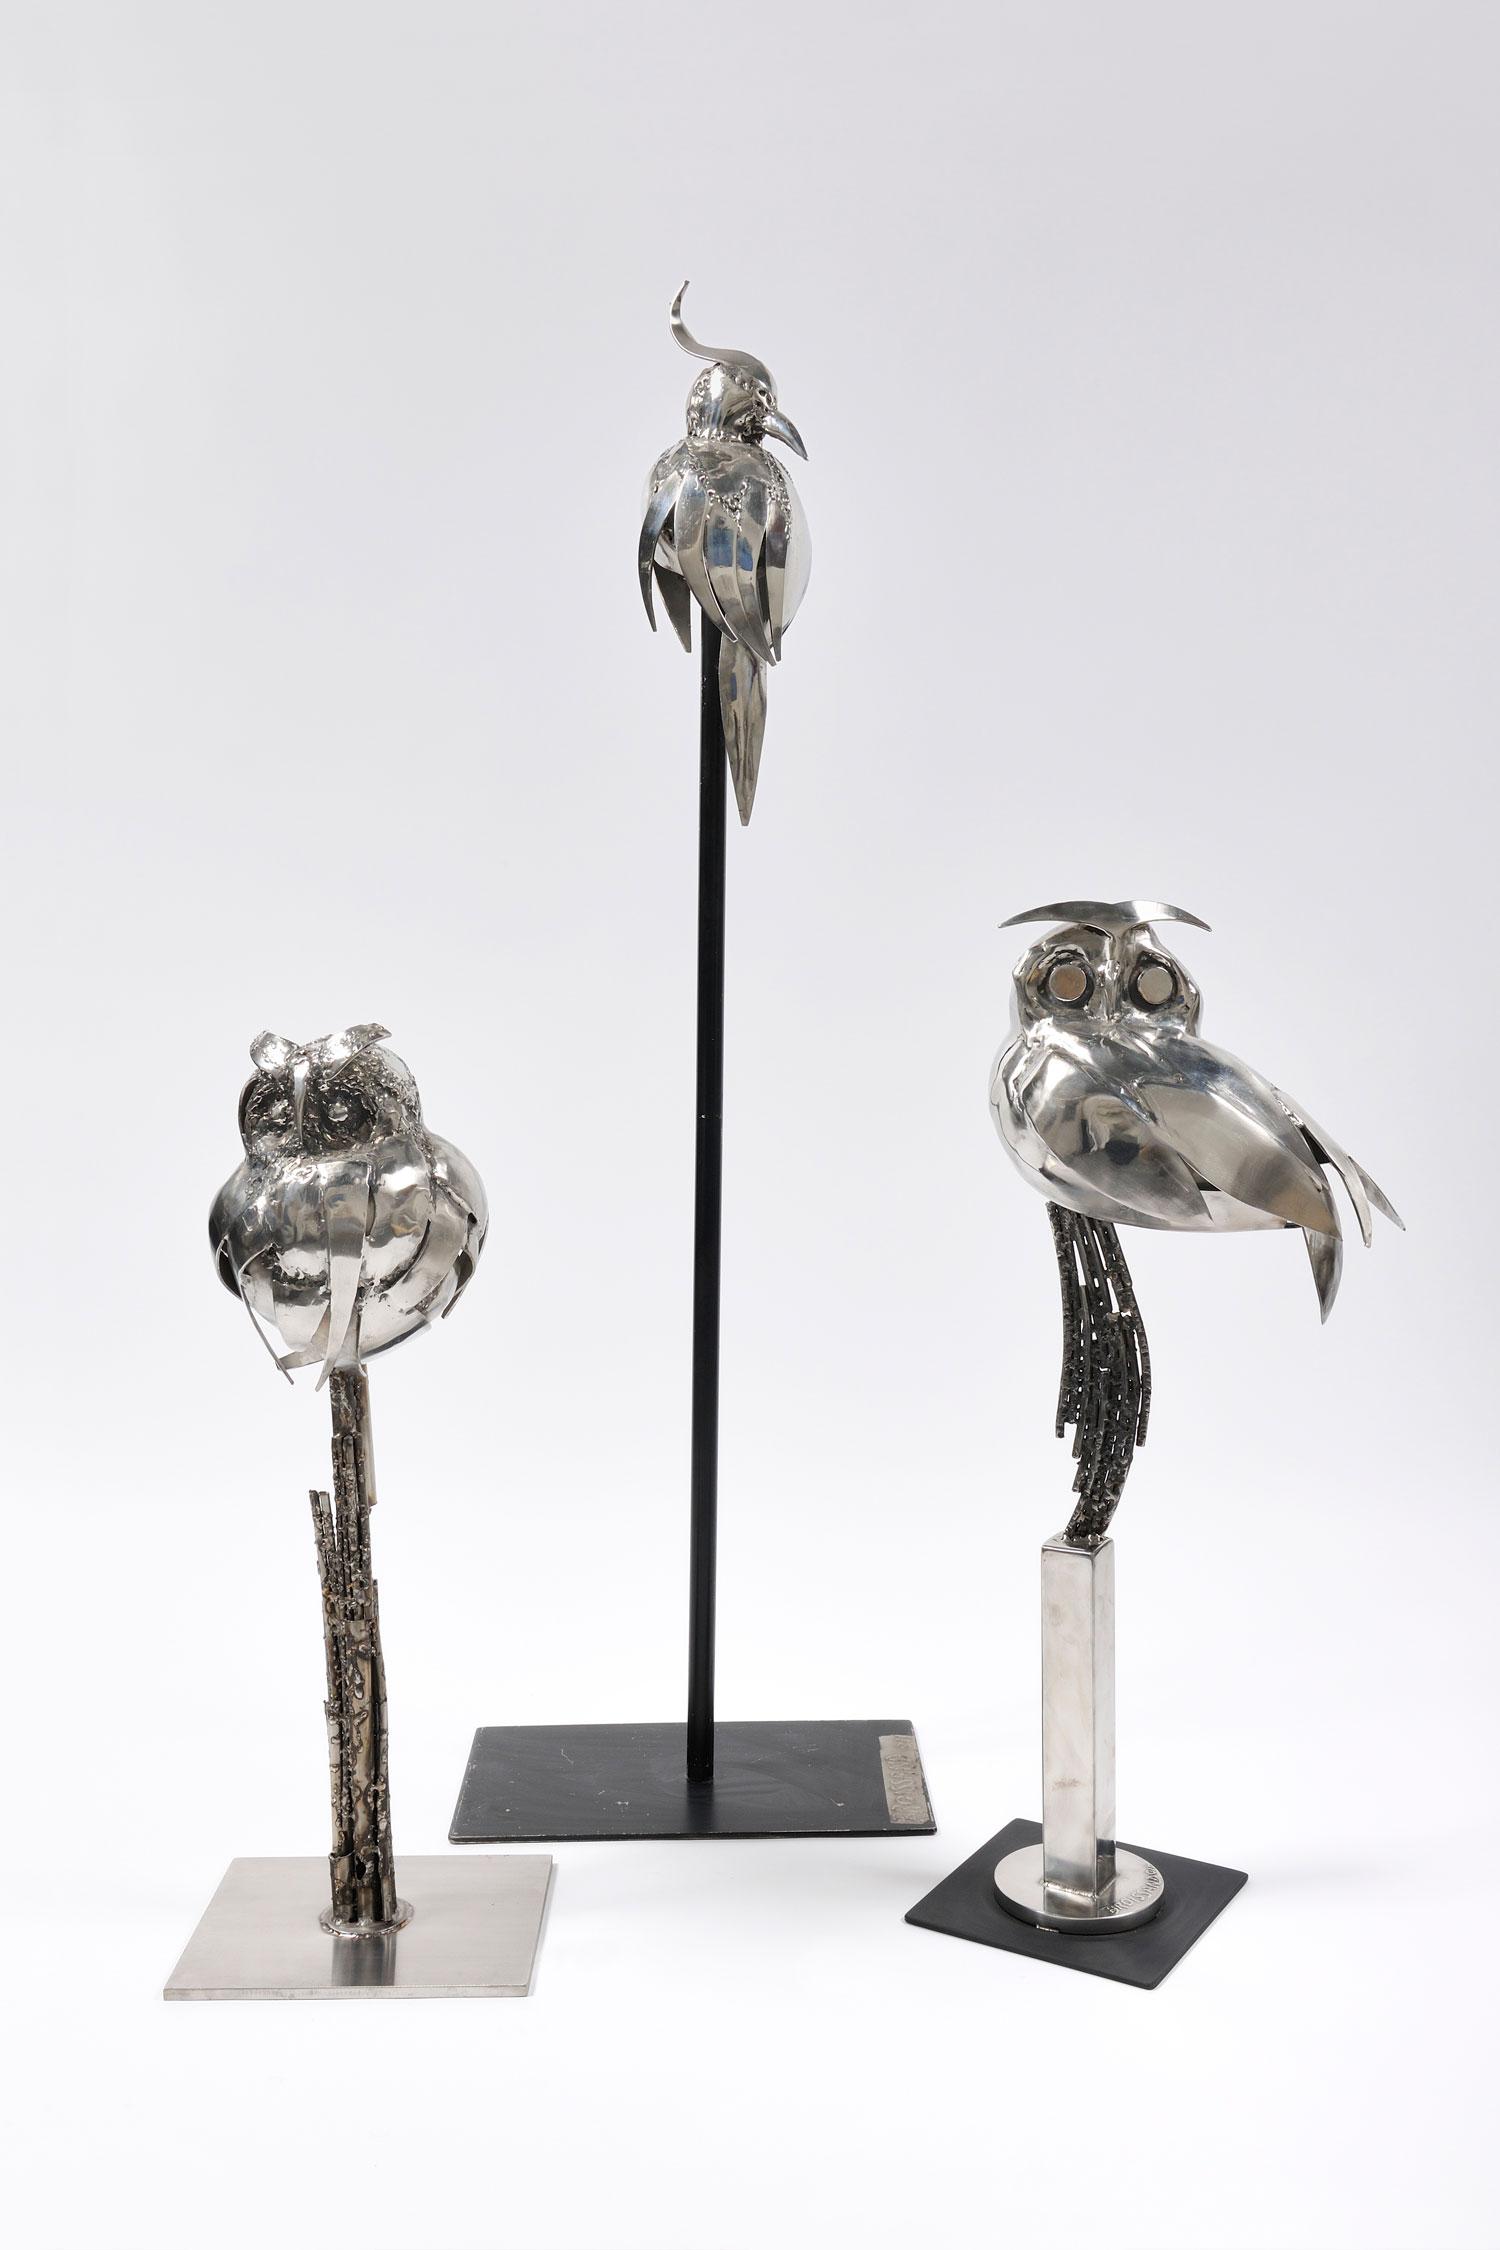 The Best of Modern Sculpture at PAD Geneve 2019 René Broissand - Ensemble d'oiseaux PAD Geneve The Best of Modern Sculpture at PAD Geneve 2019: René Broissand The Best of Modern Sculpture at PAD 2019 Ren   Broissand Ensemble d   oiseaux